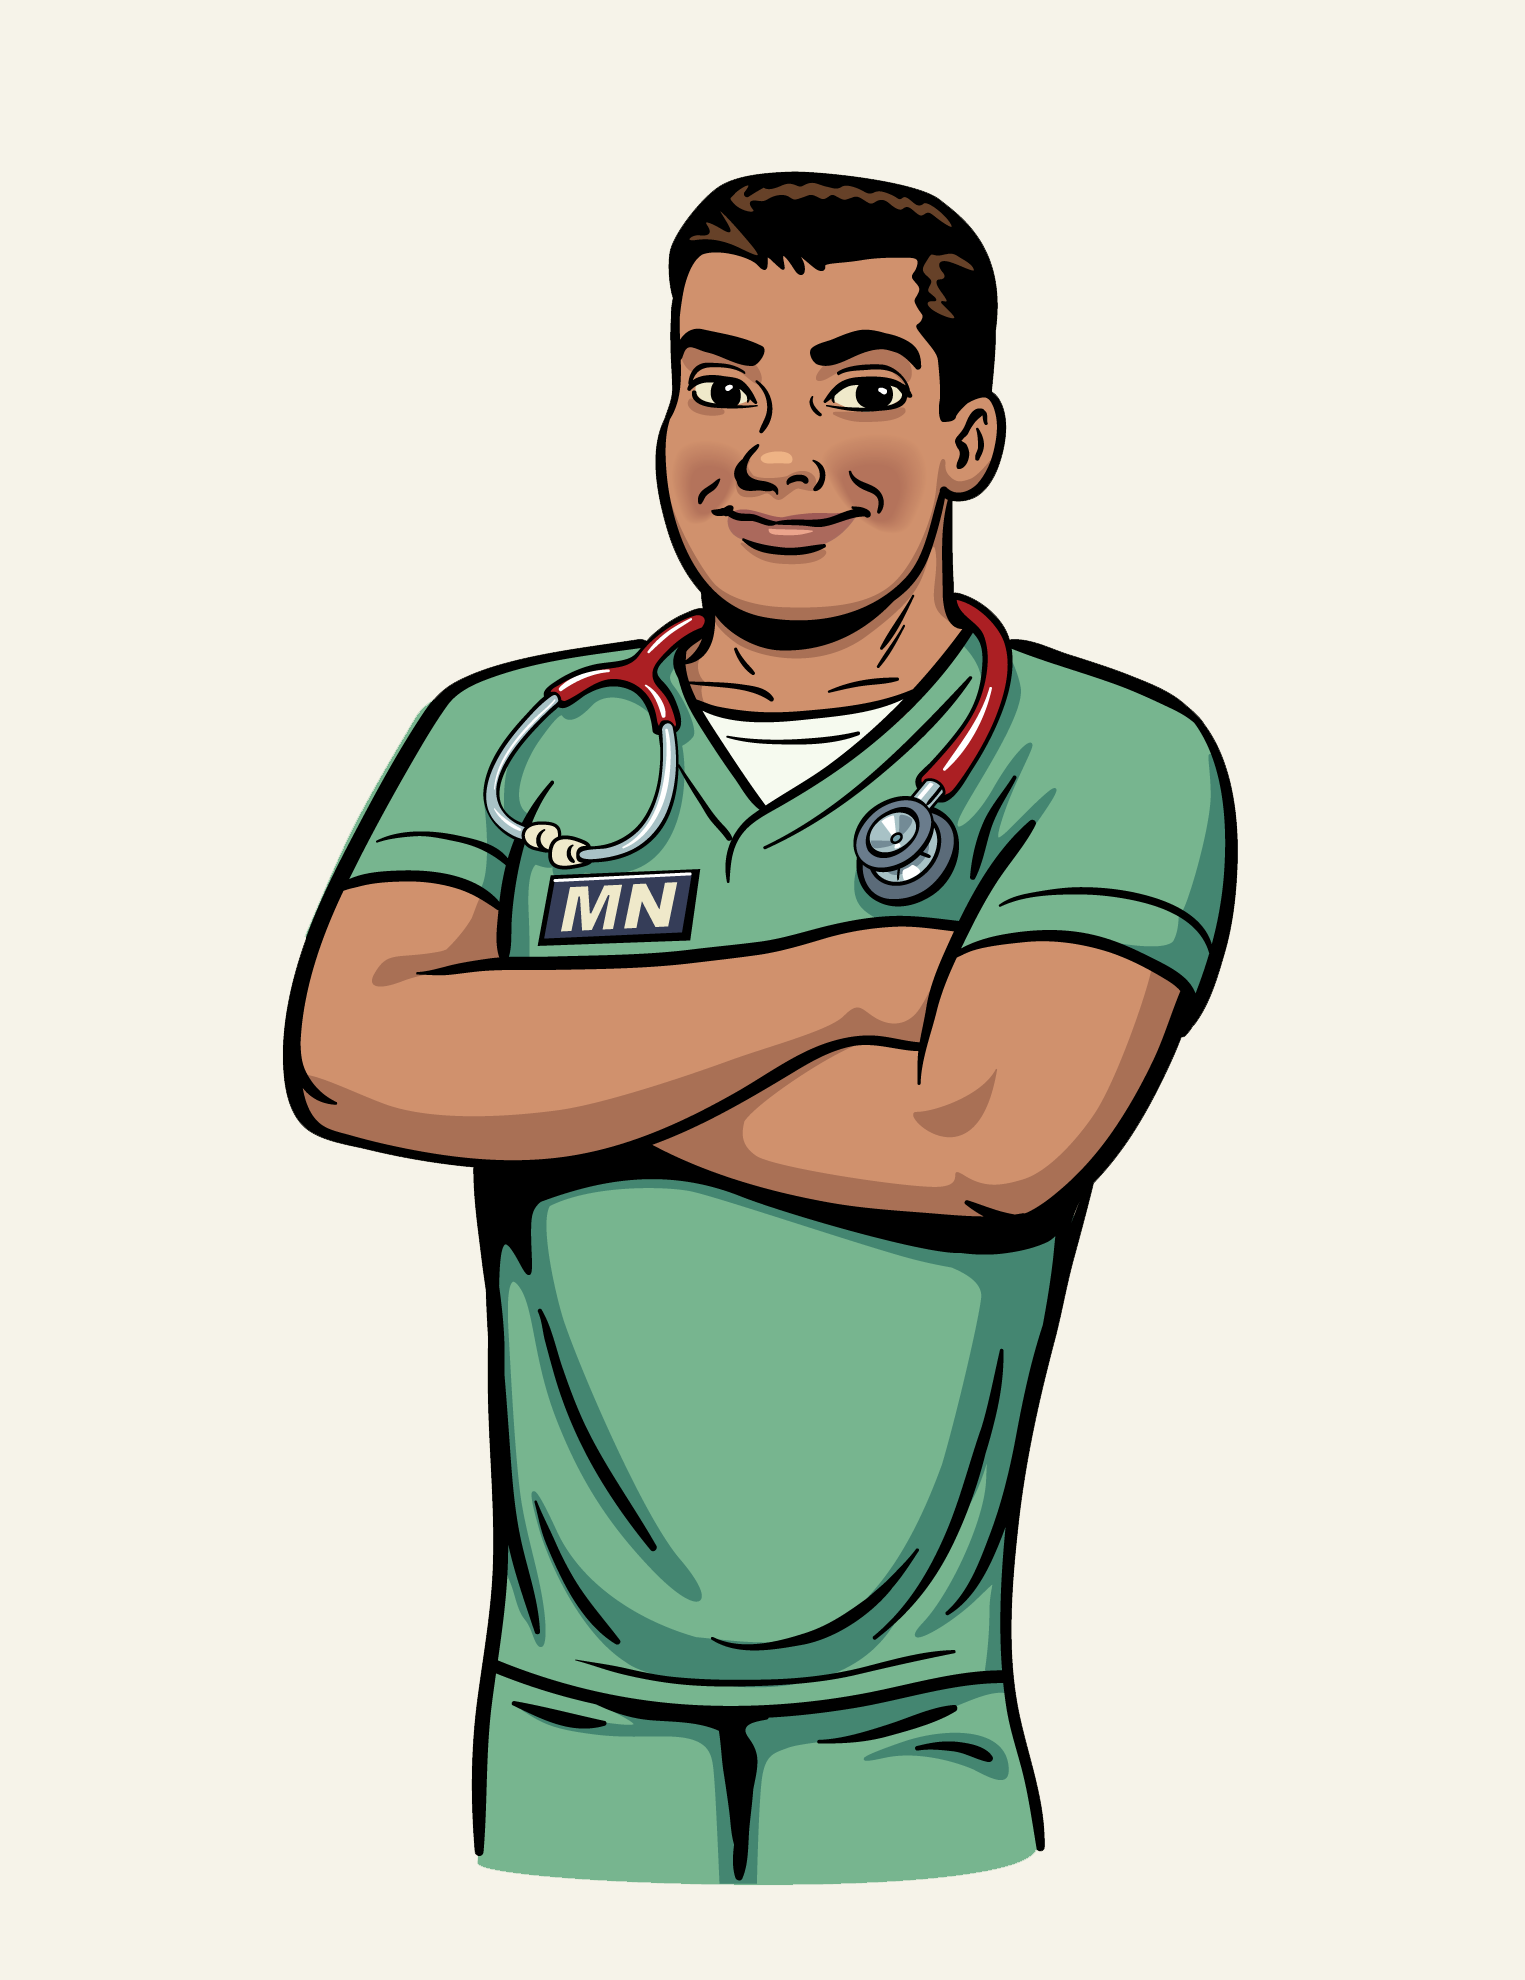 Male Nurse Cartoons - Cliparts.co